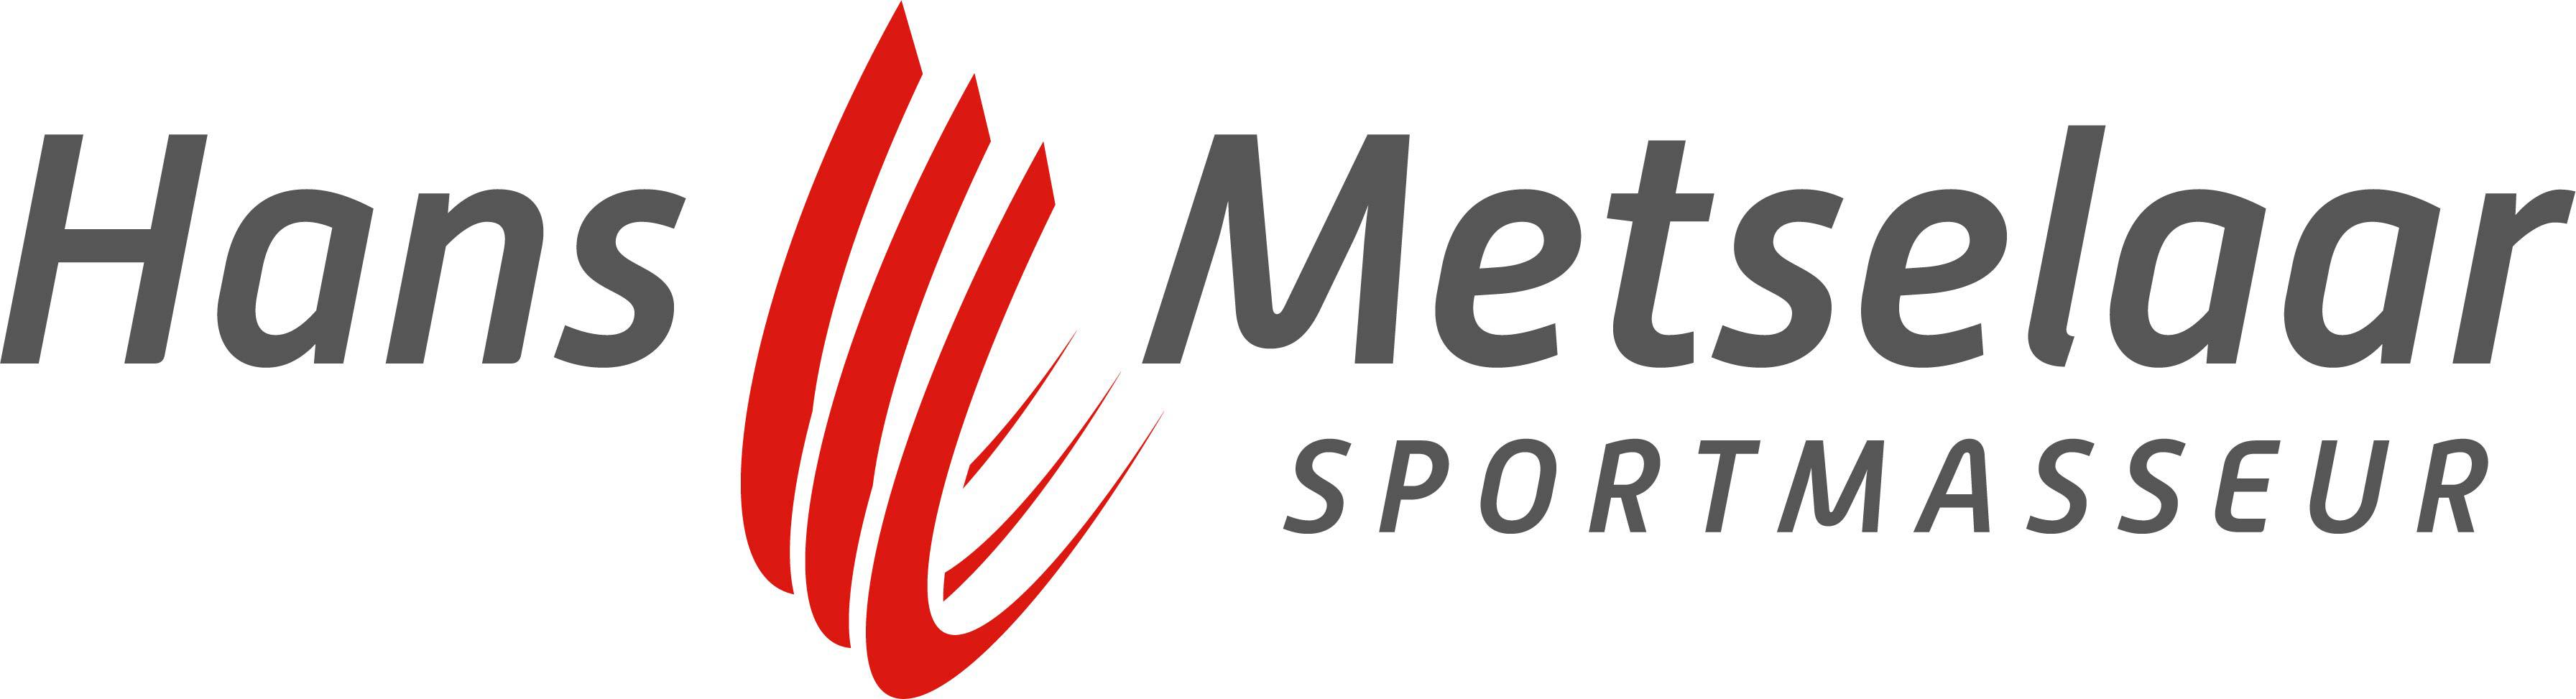 Hans Metselaar logo cmyk